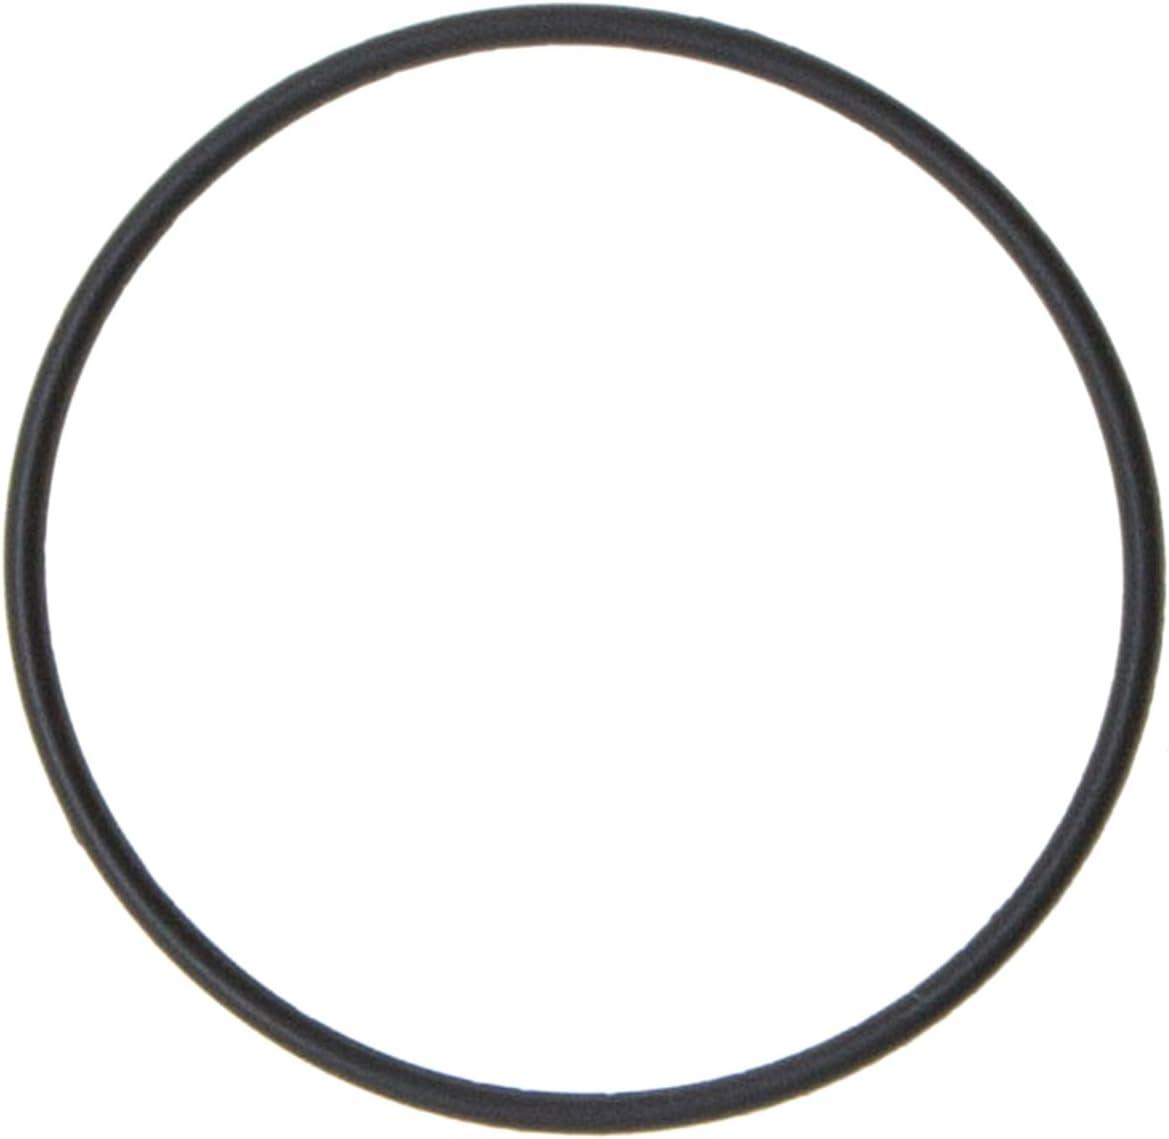 20 Stück O-Ring 27x3 27 x 3 mm Schnurstärke NBR 70 Dichtring Ring Nullring